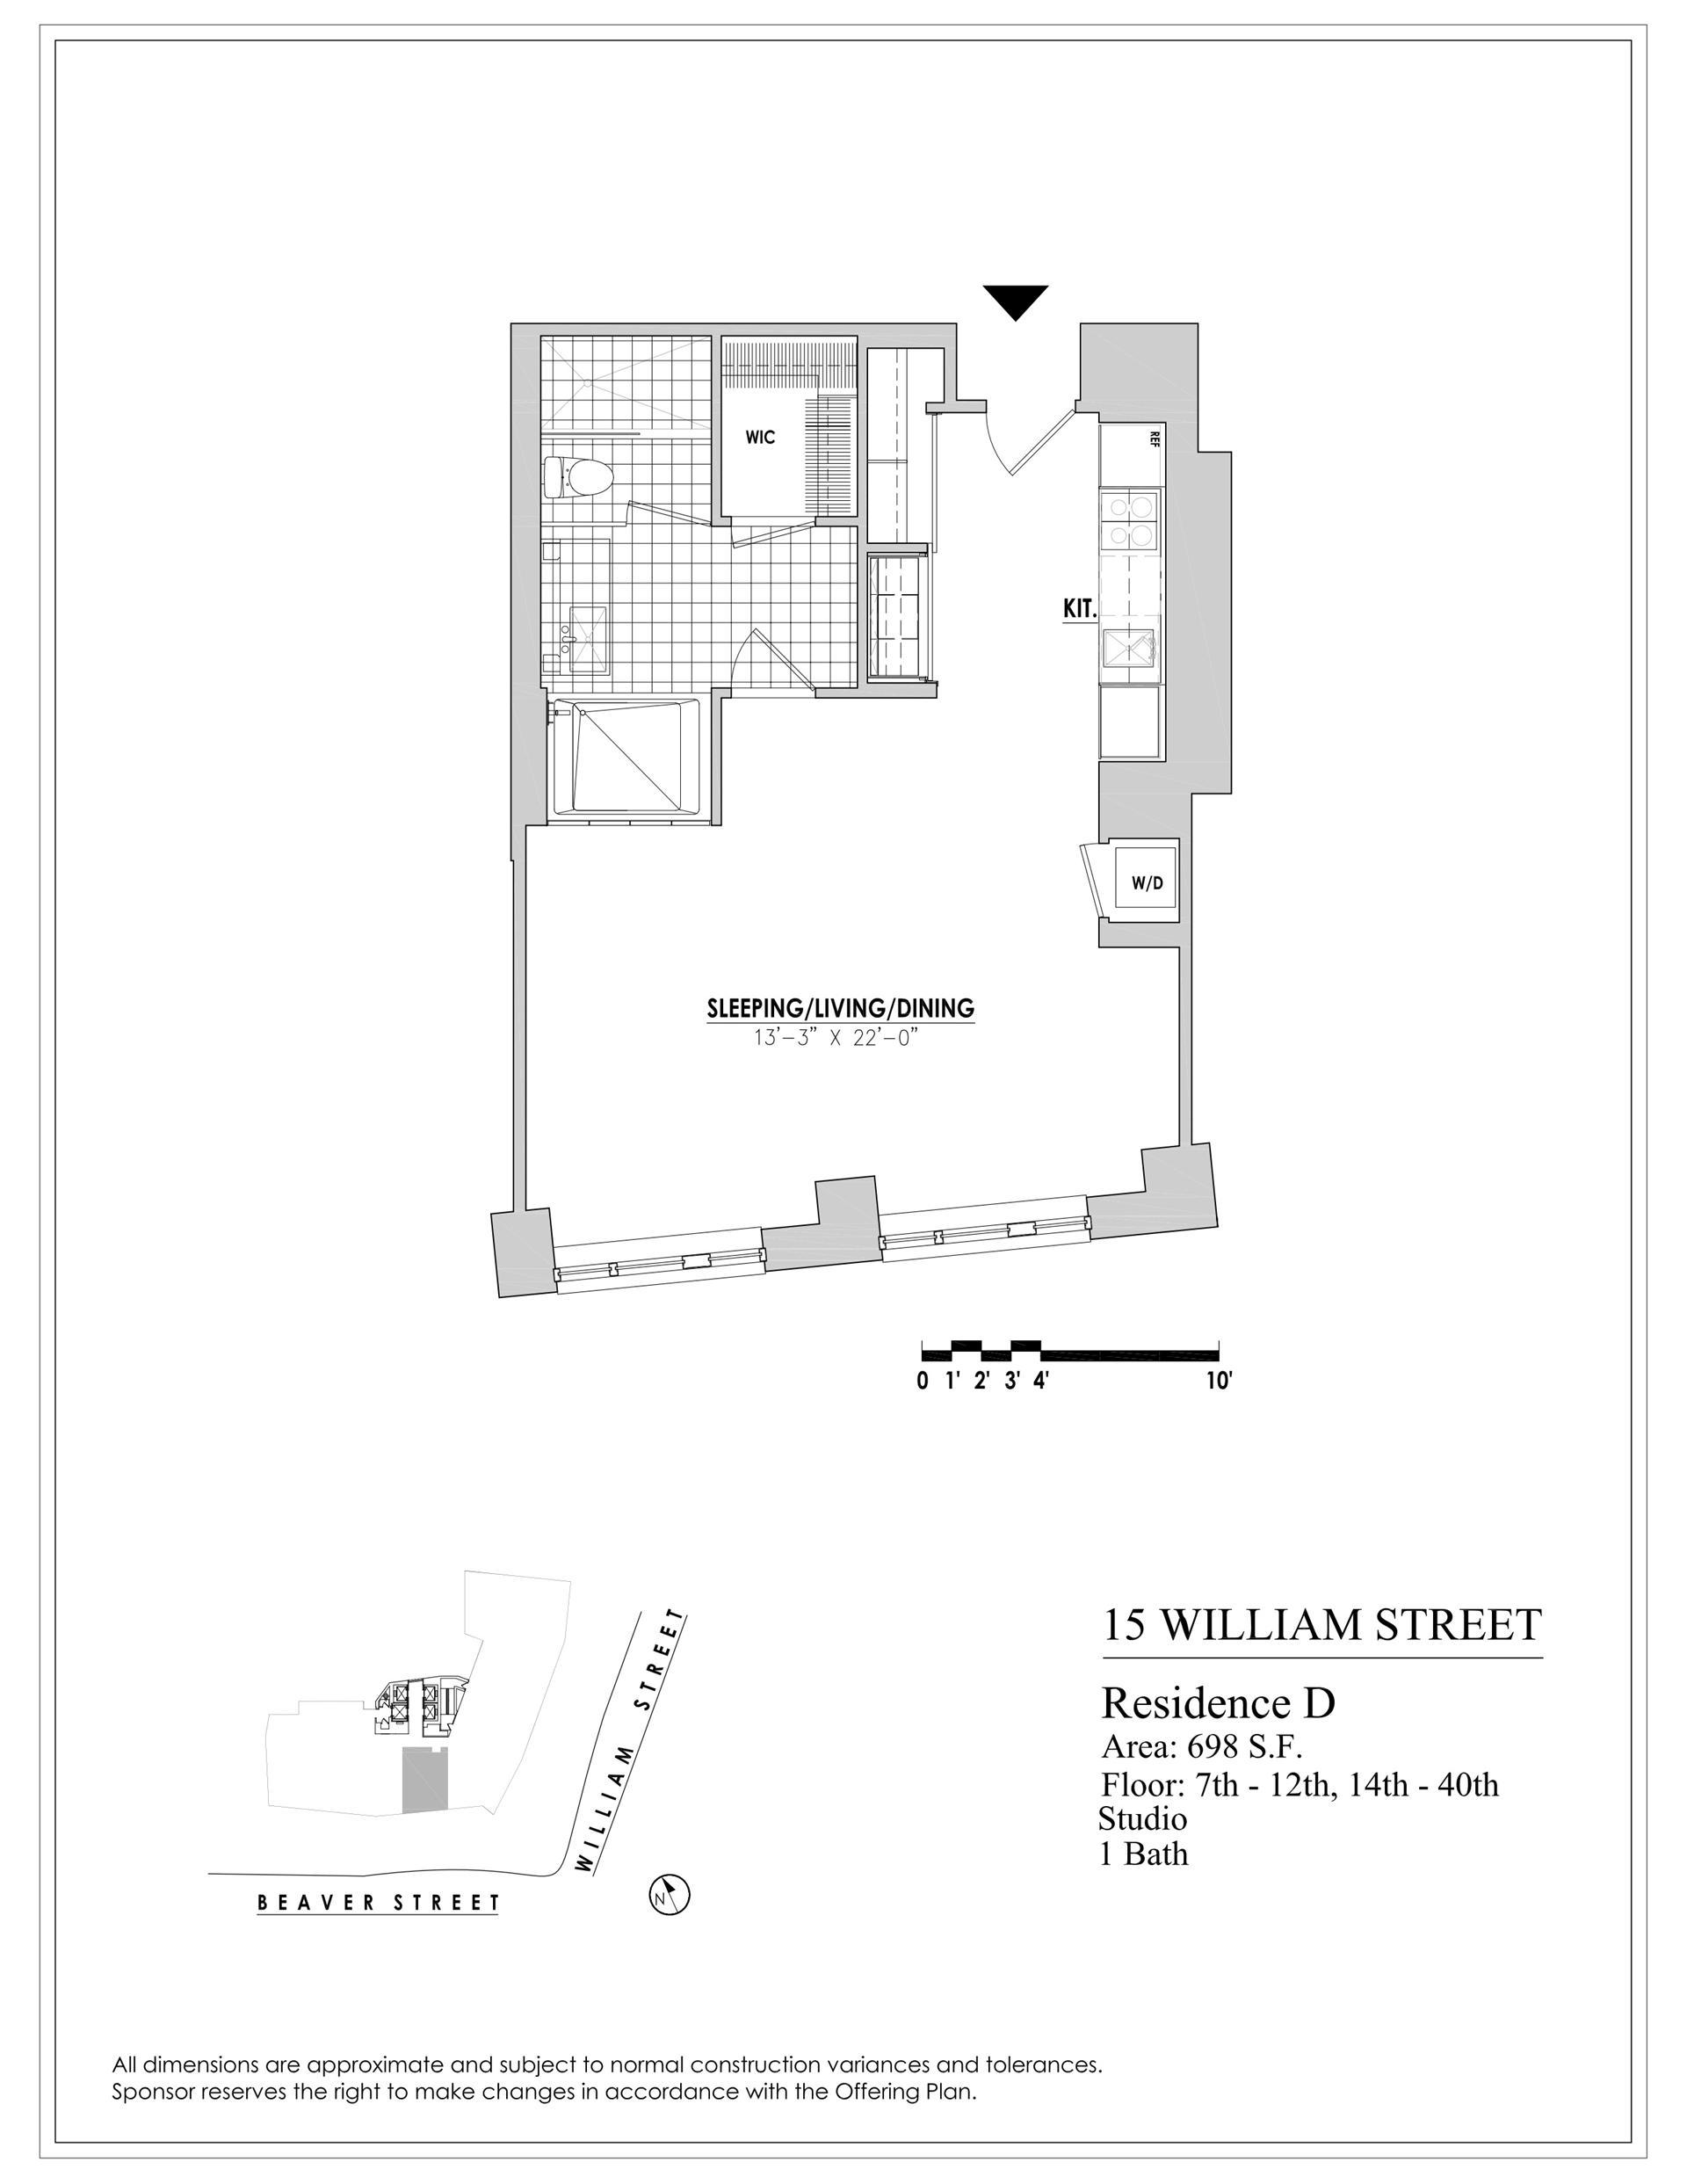 Floor plan of 15 William, 15 William St, 9D - Financial District, New York